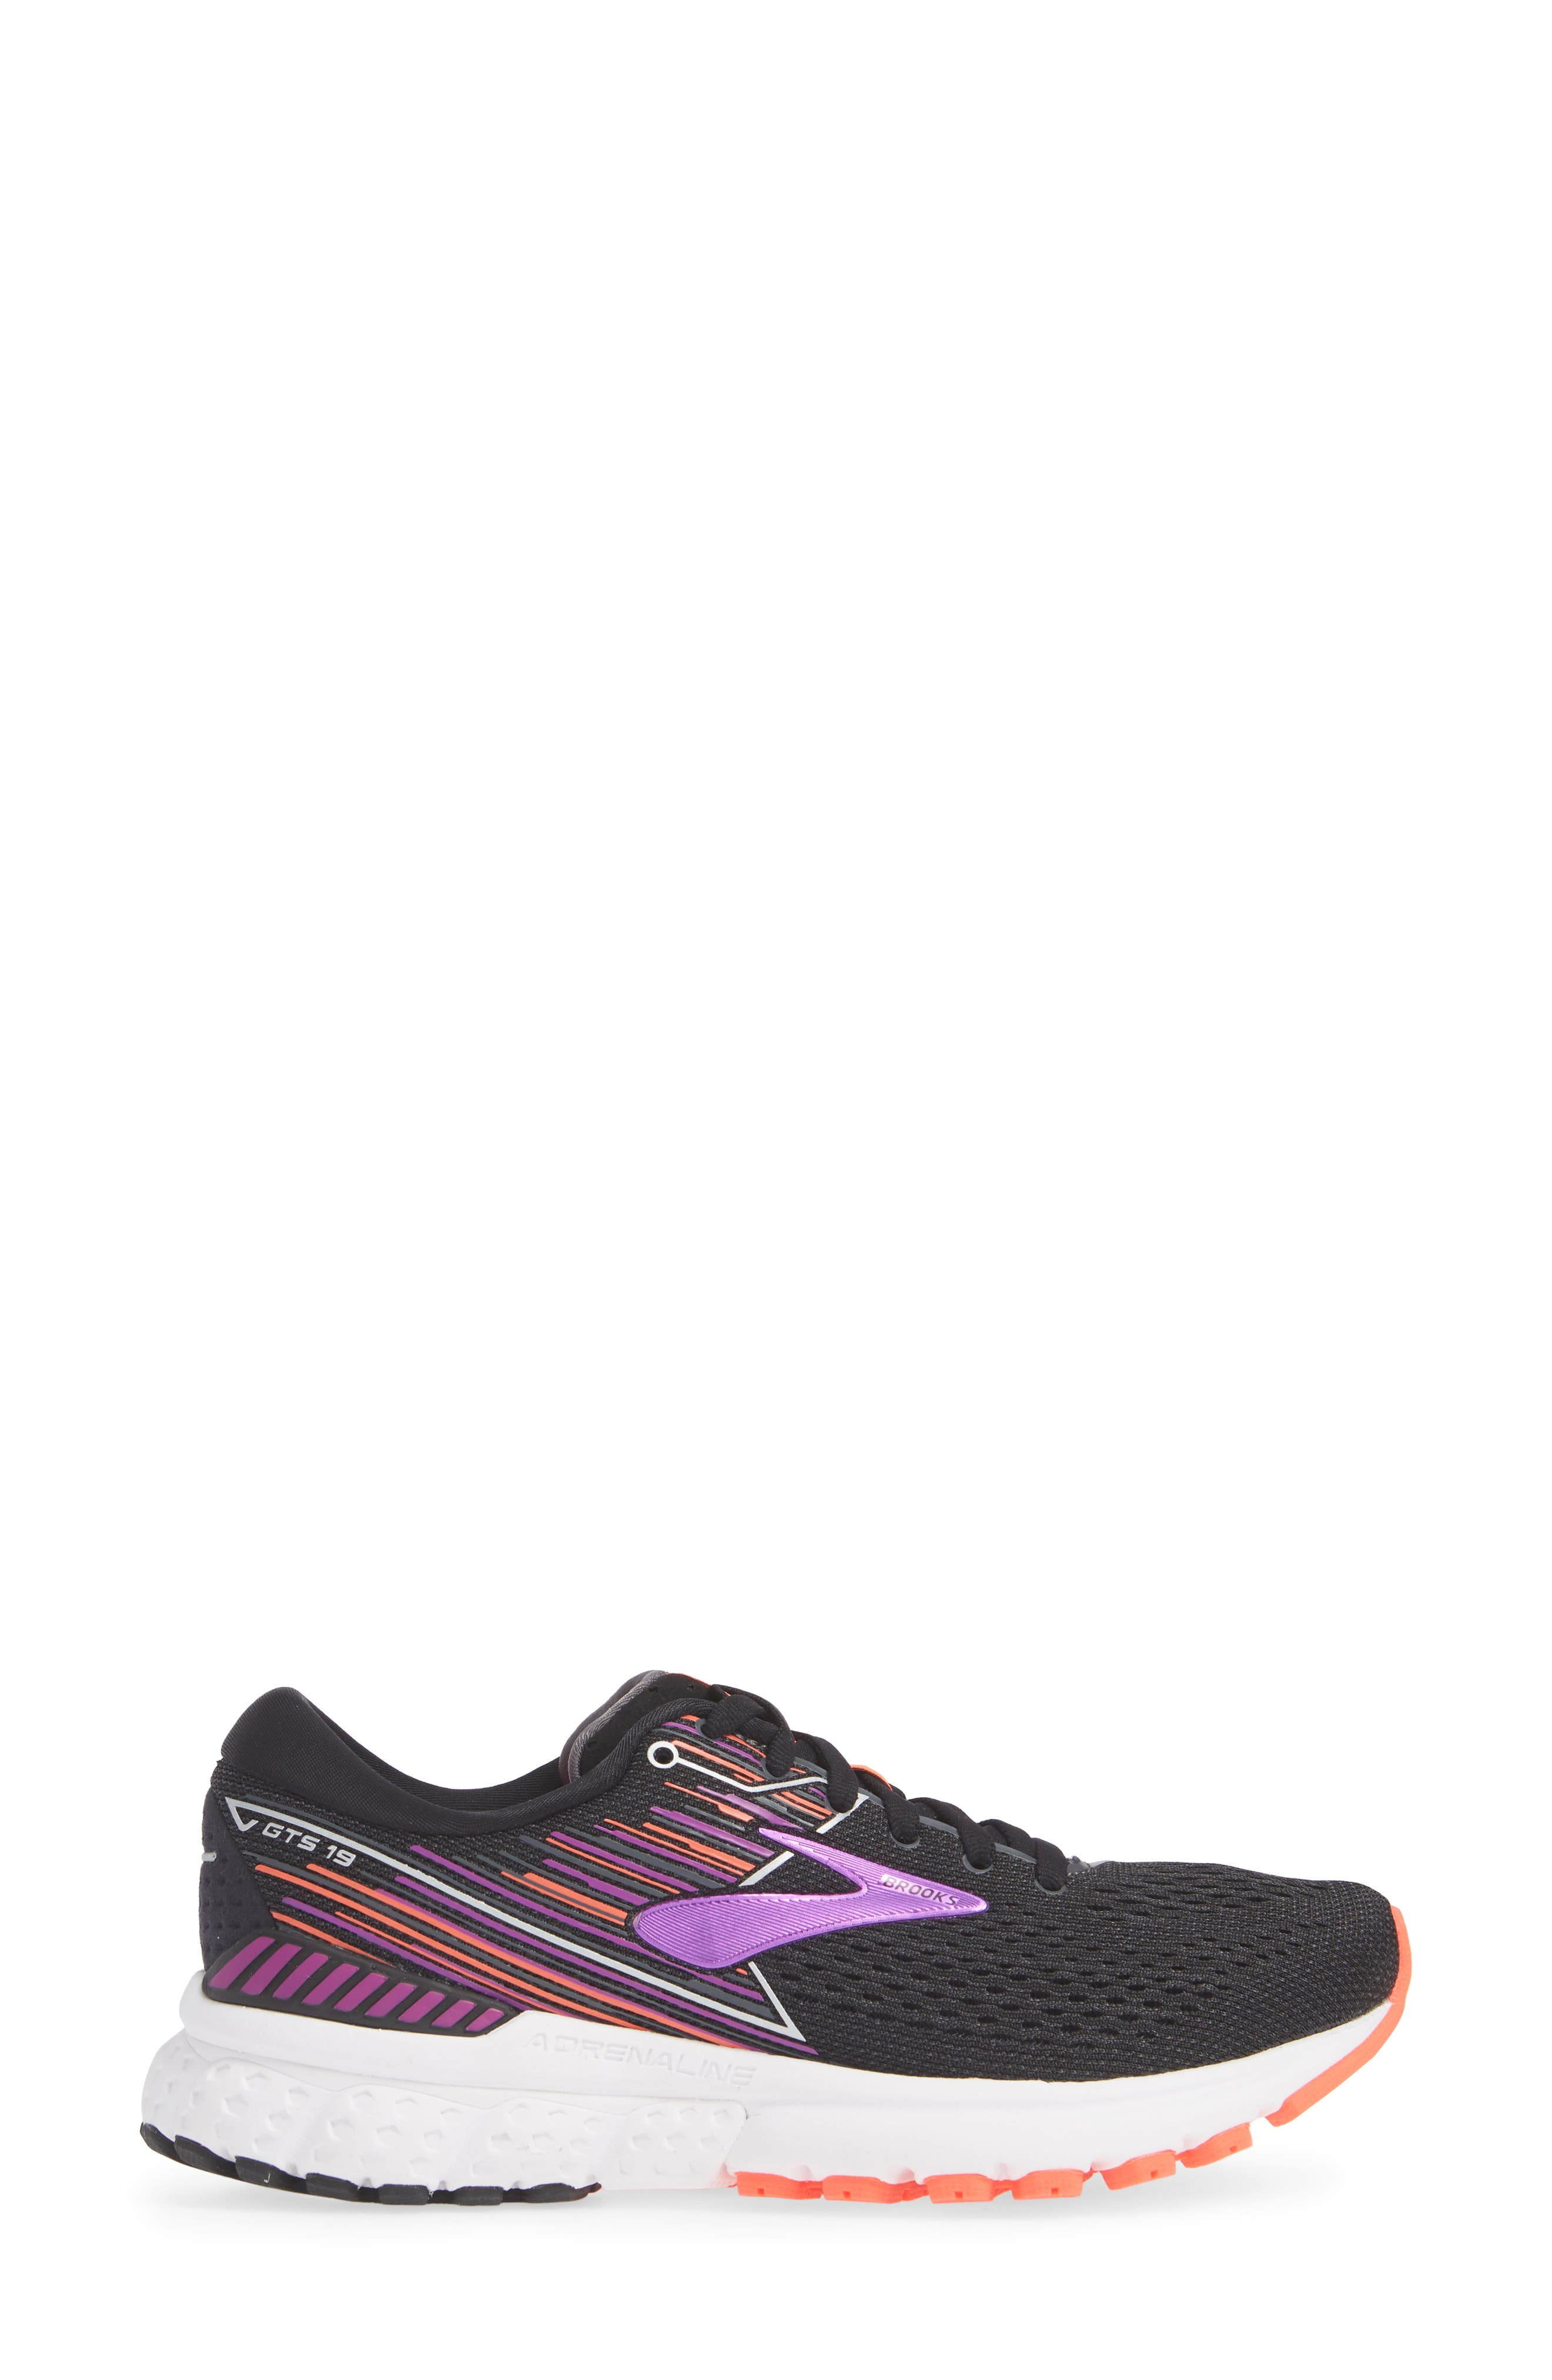 Adrenaline GTS 19 Running Shoe,                             Alternate thumbnail 3, color,                             BLACK/ PURPLE/ CORAL